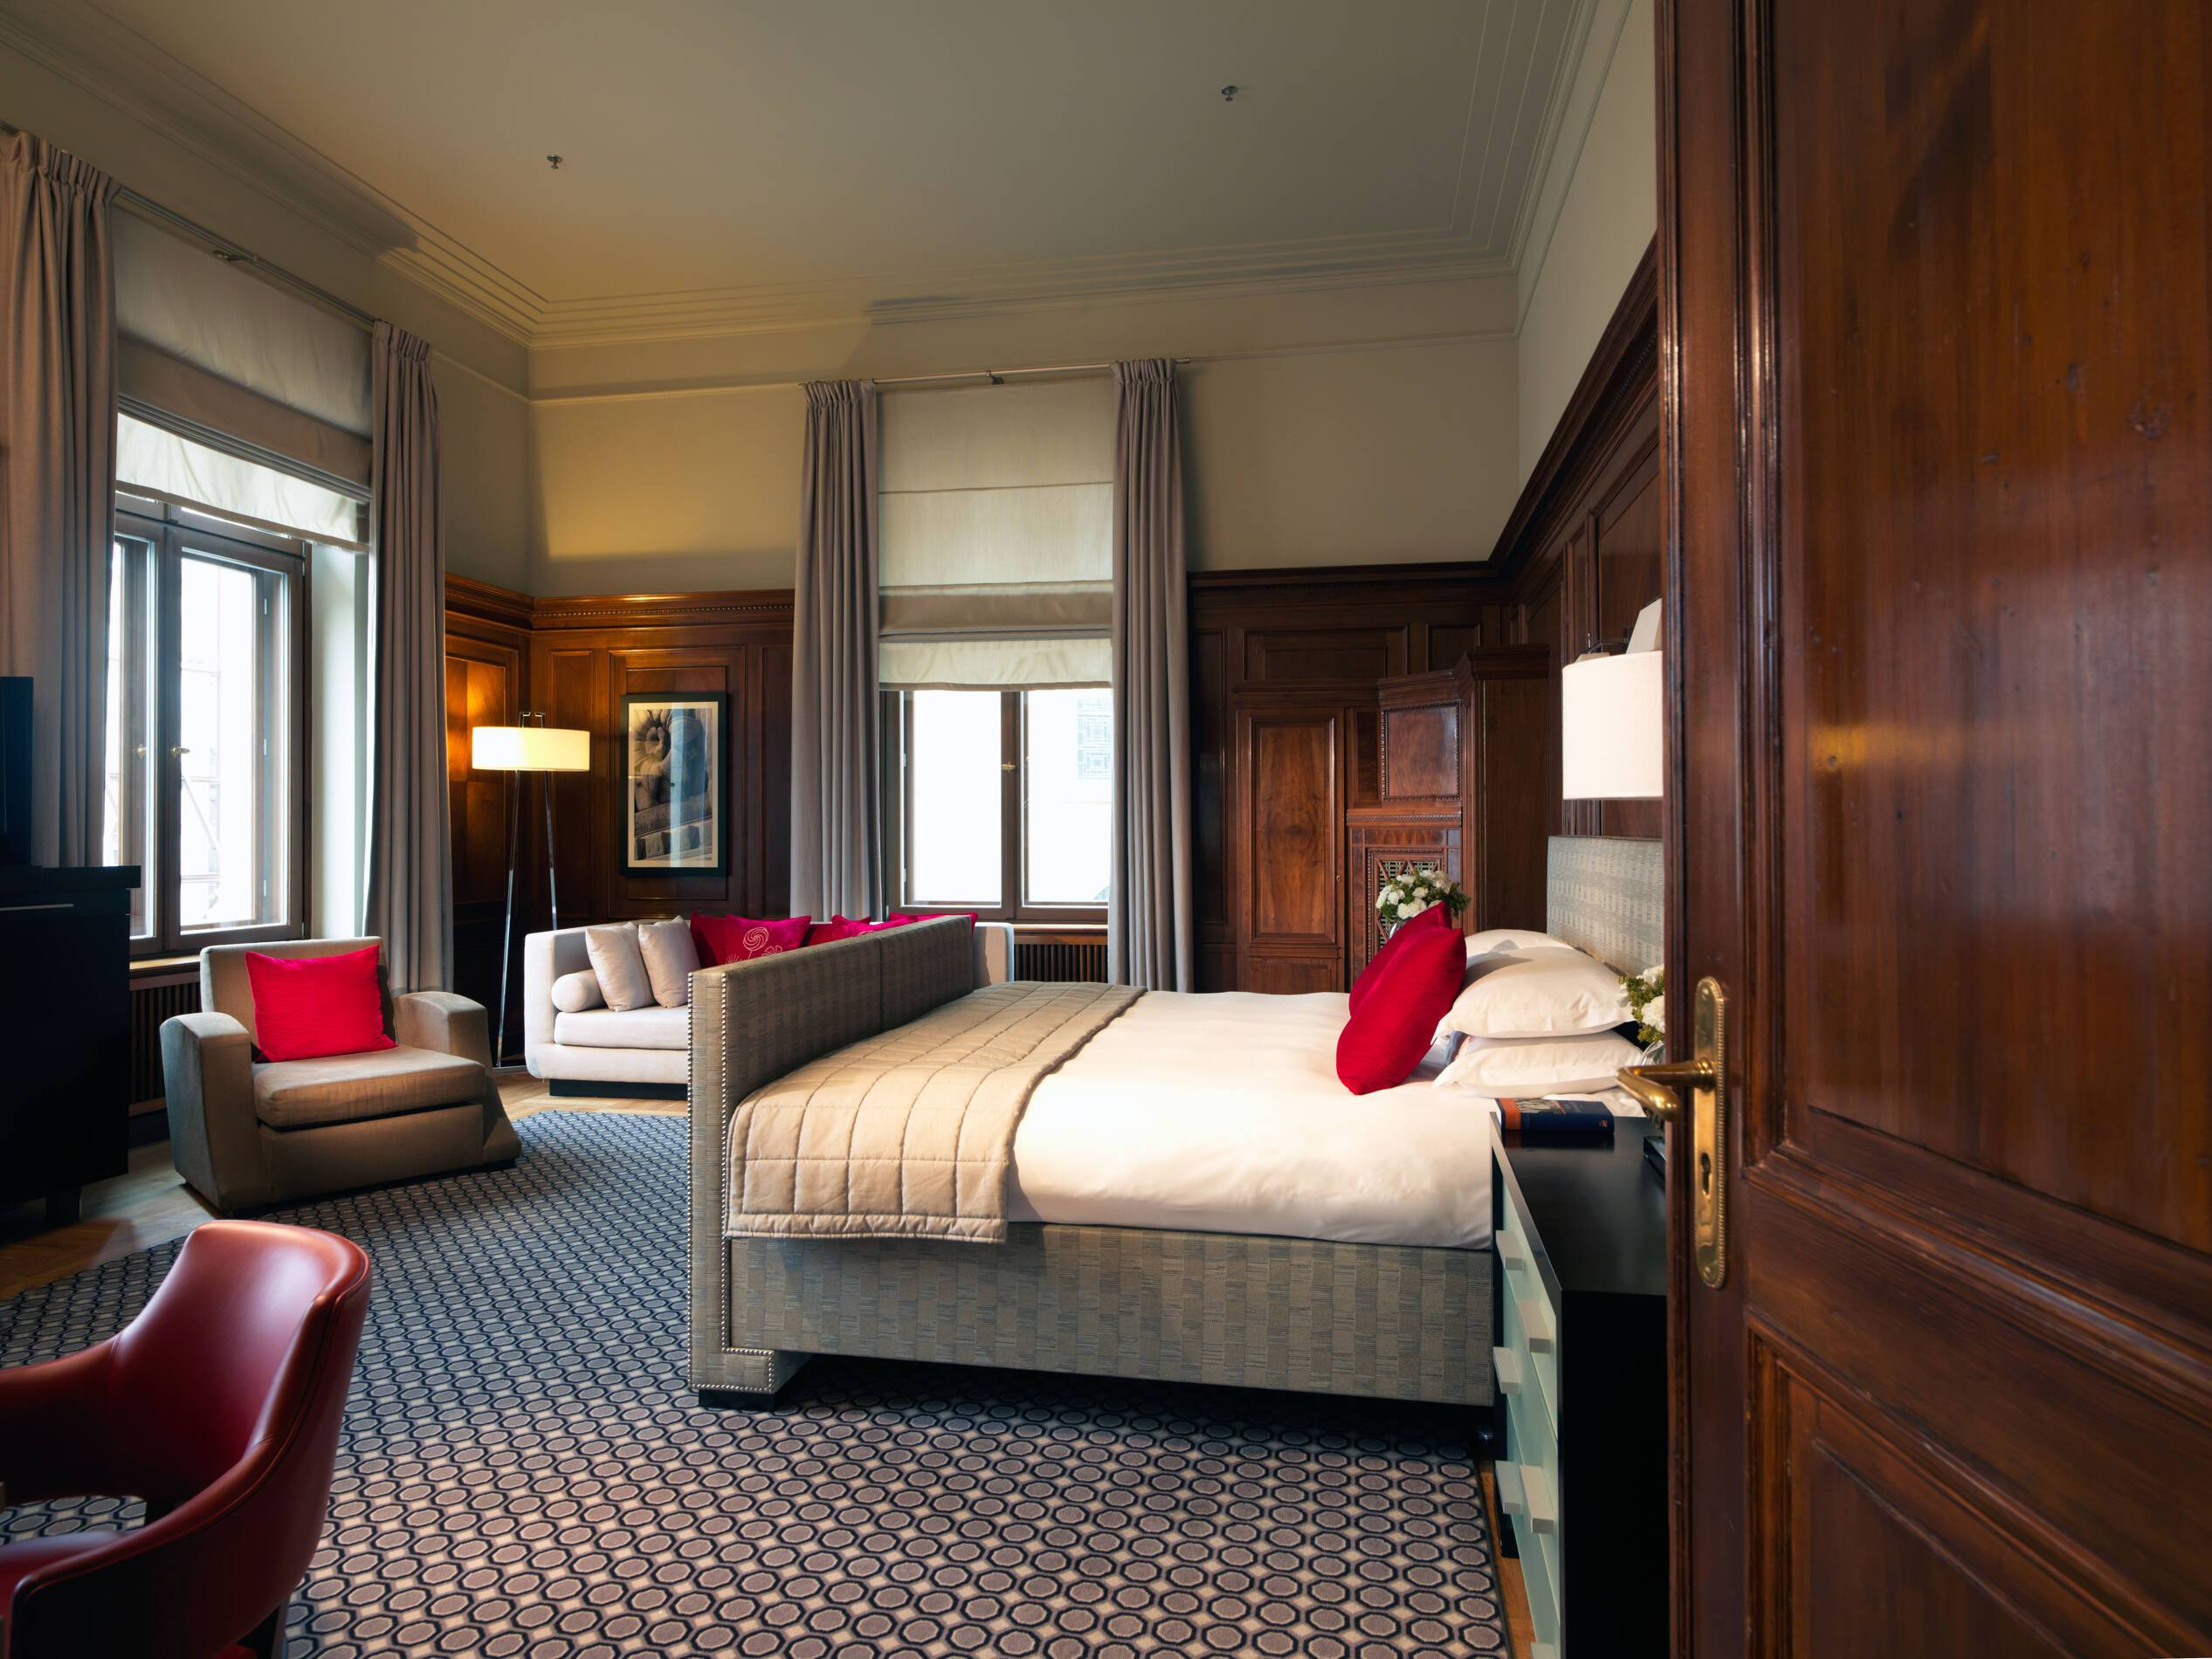 Hotel de Rome Berlin Rocco Forte Gutmann Suite